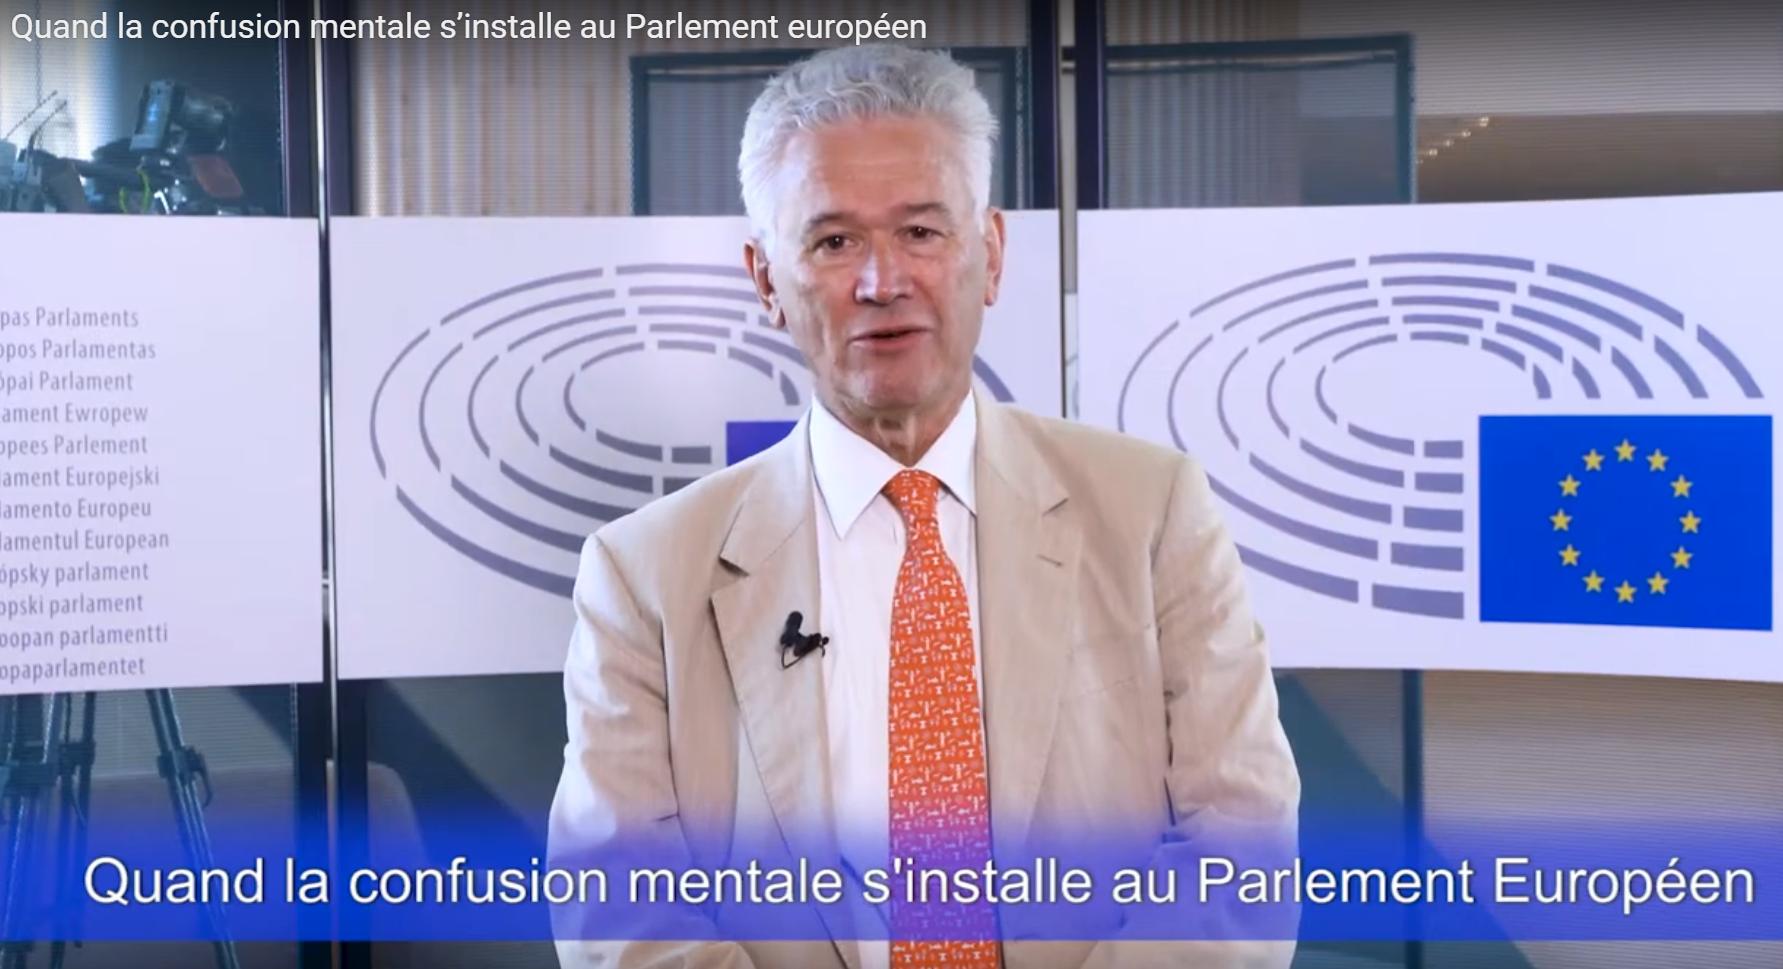 CETA & parlement européen